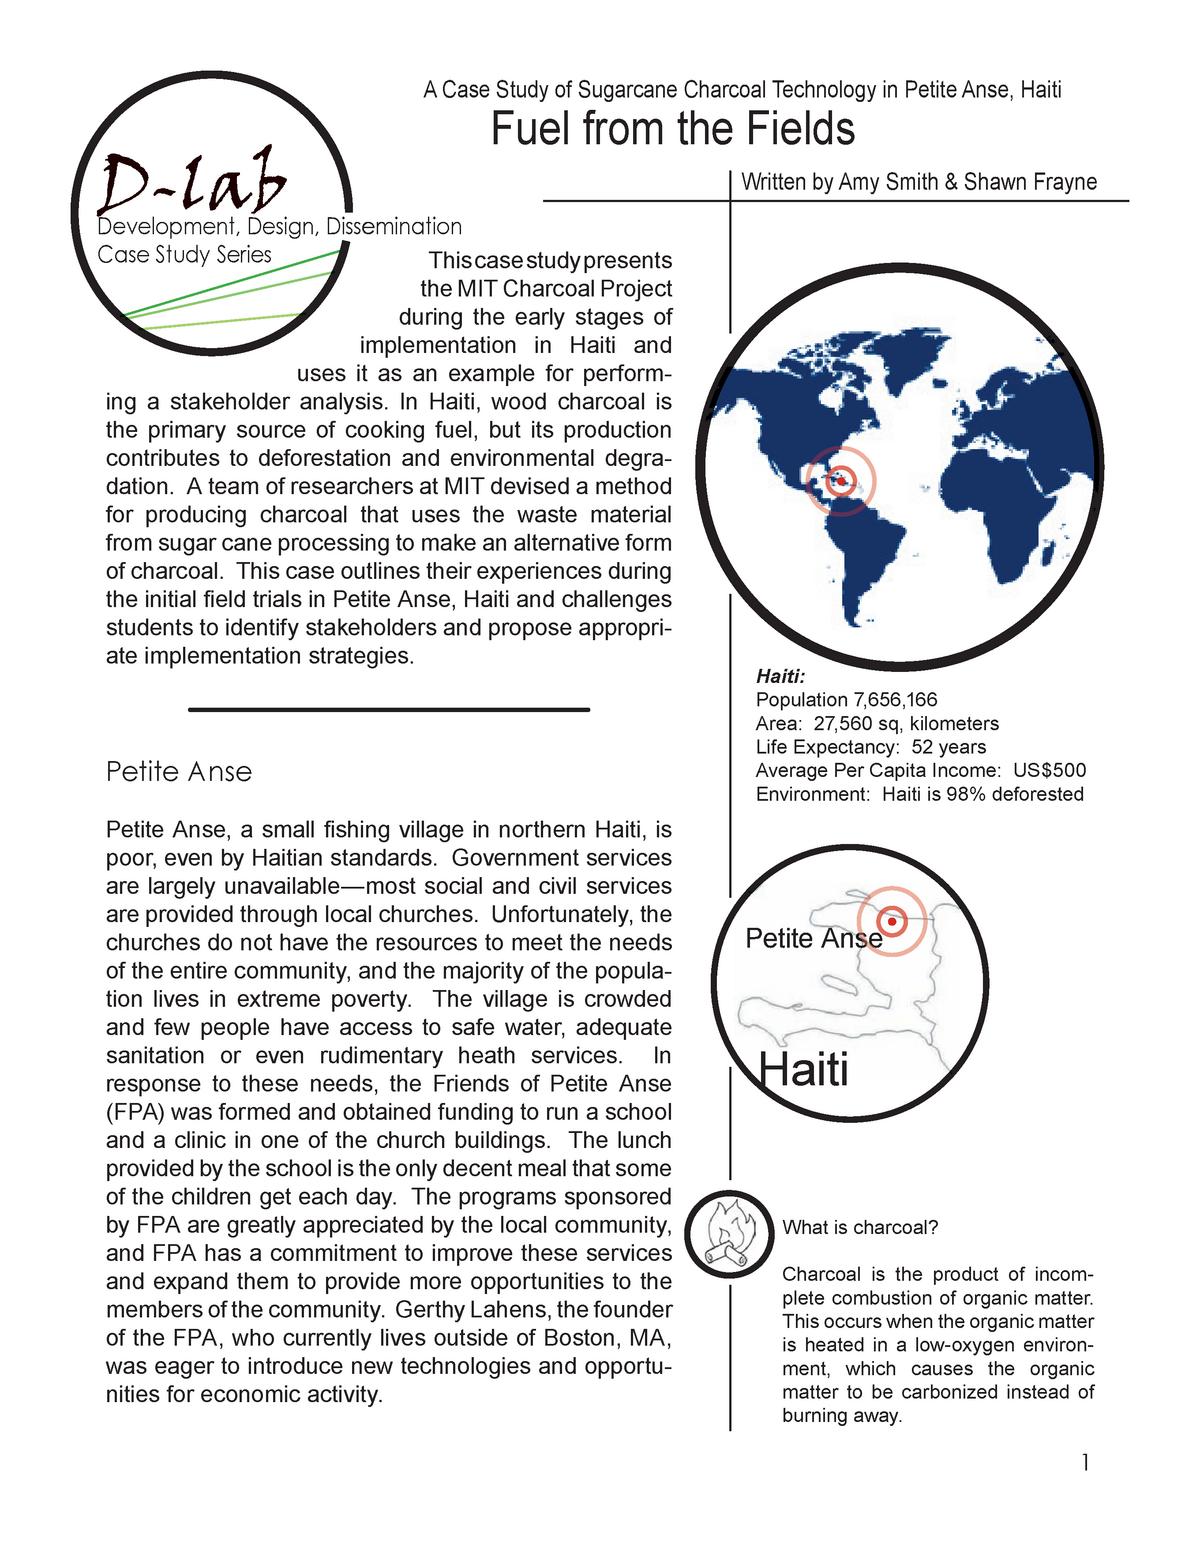 Seminar assignments Week 2 to 18 - EC  701J: D-Lab: Development